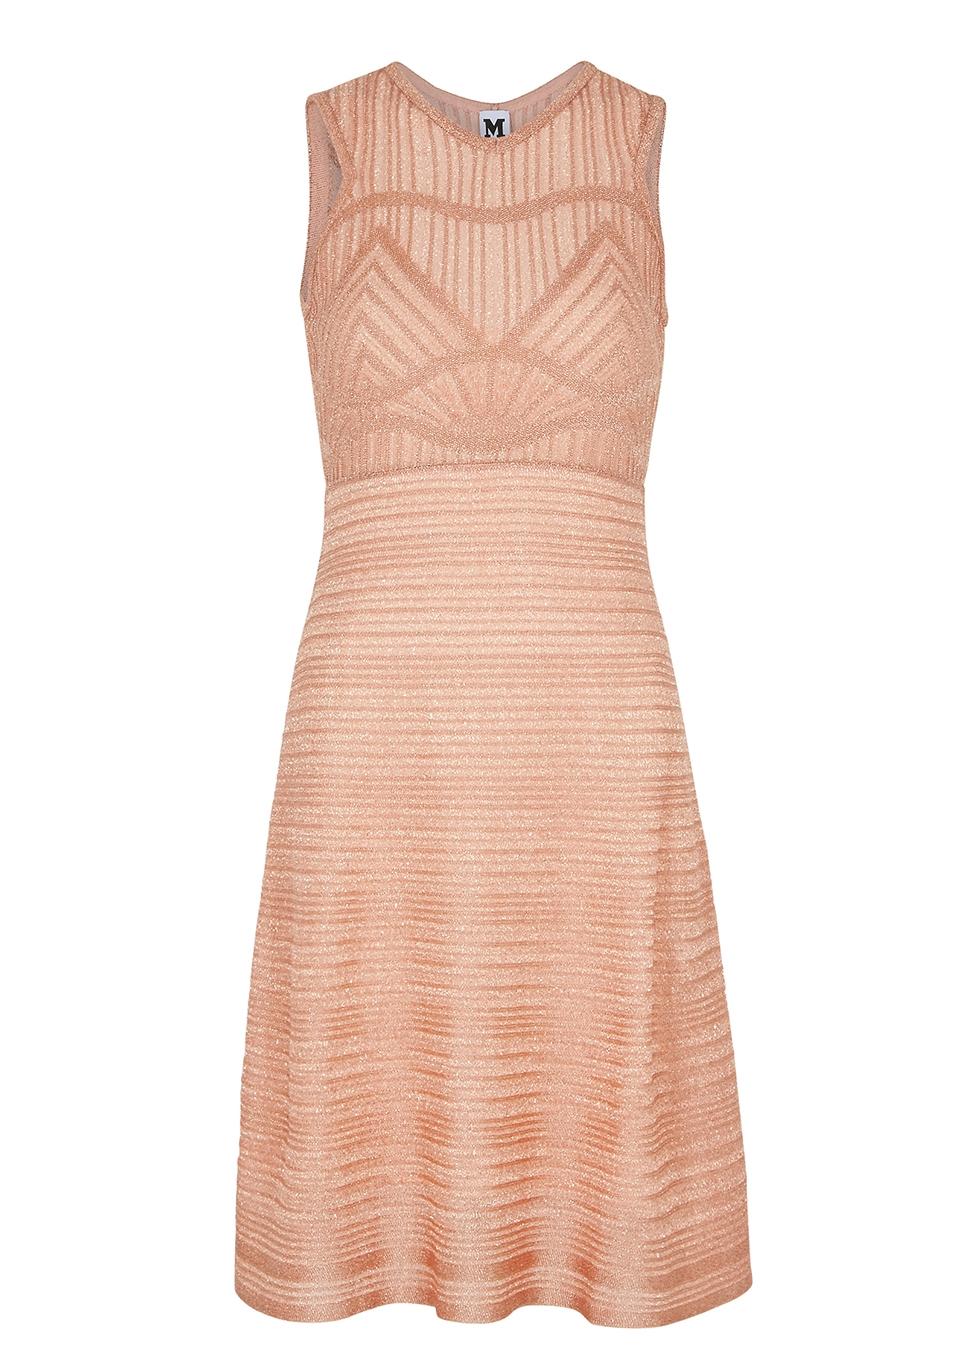 Light pink metallic-knit lamé dress - M Missoni